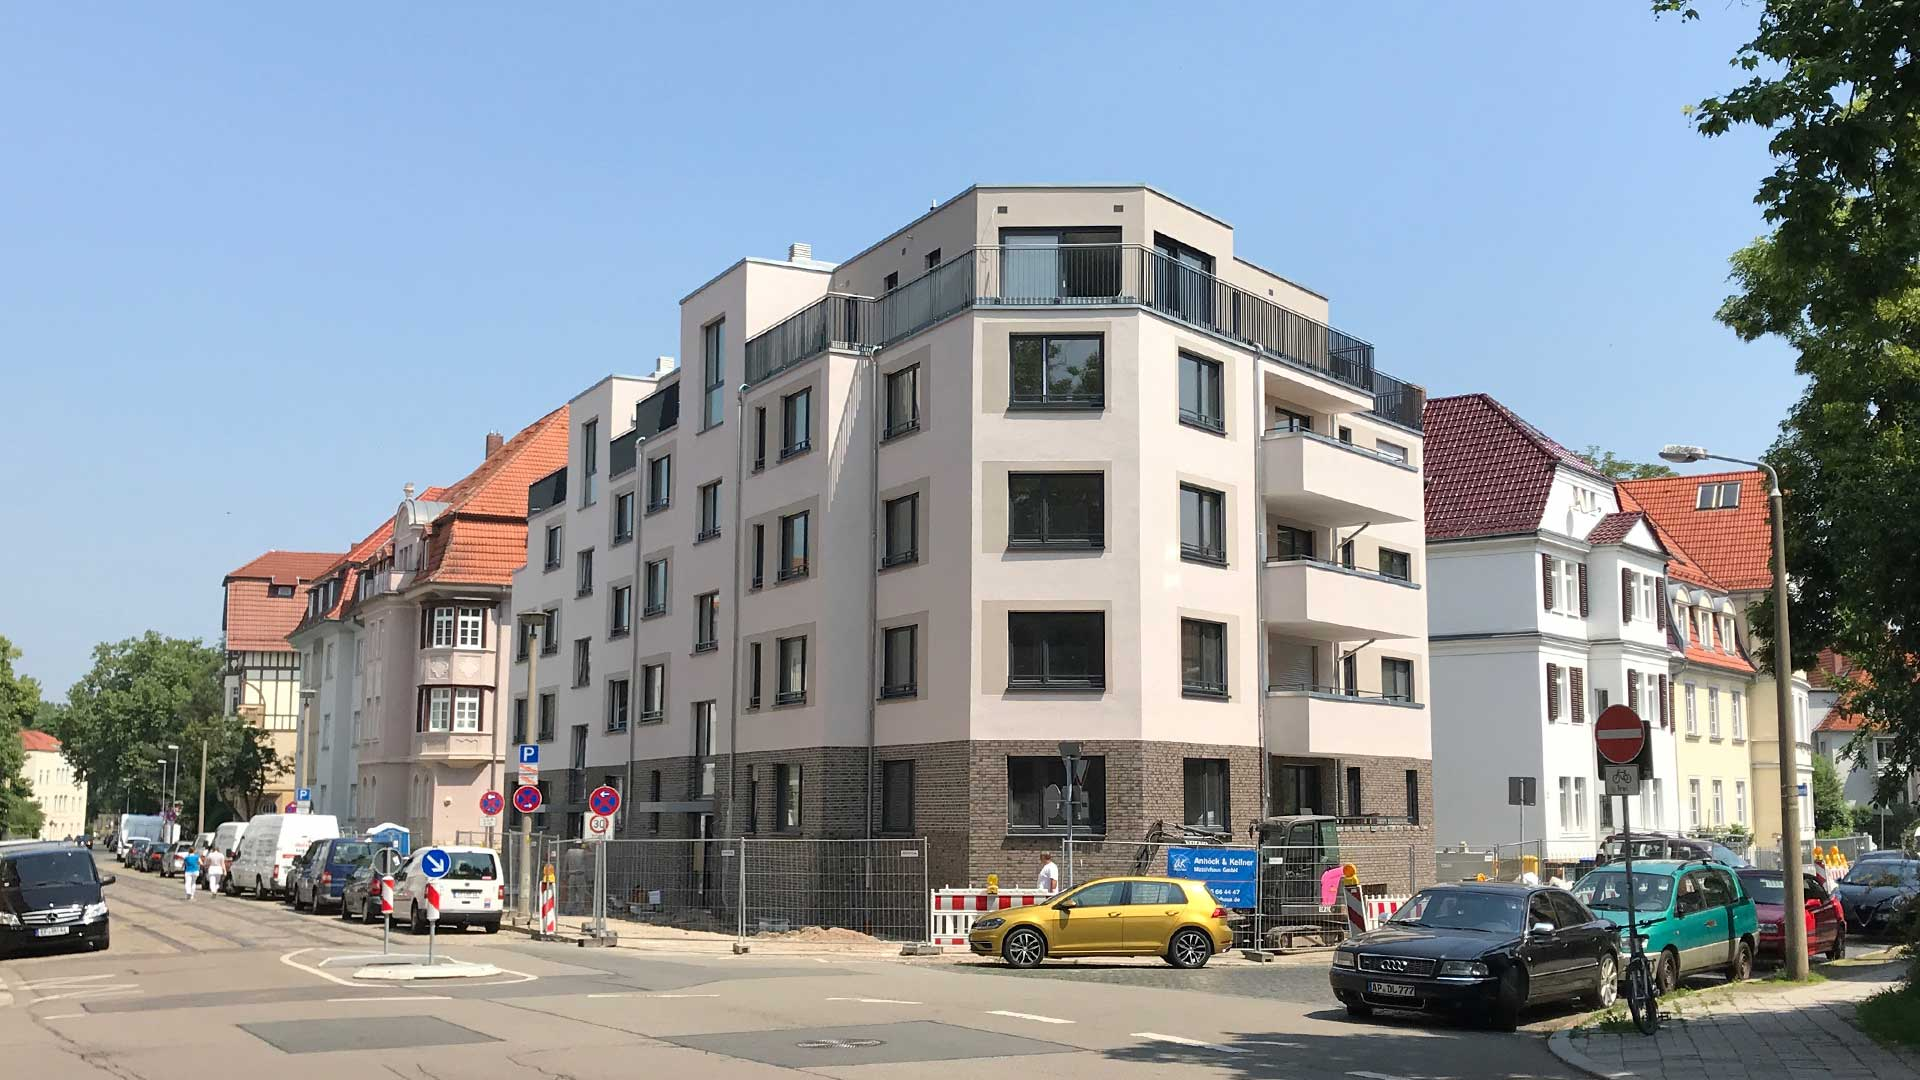 Baufortschritt im Dalbergsweg